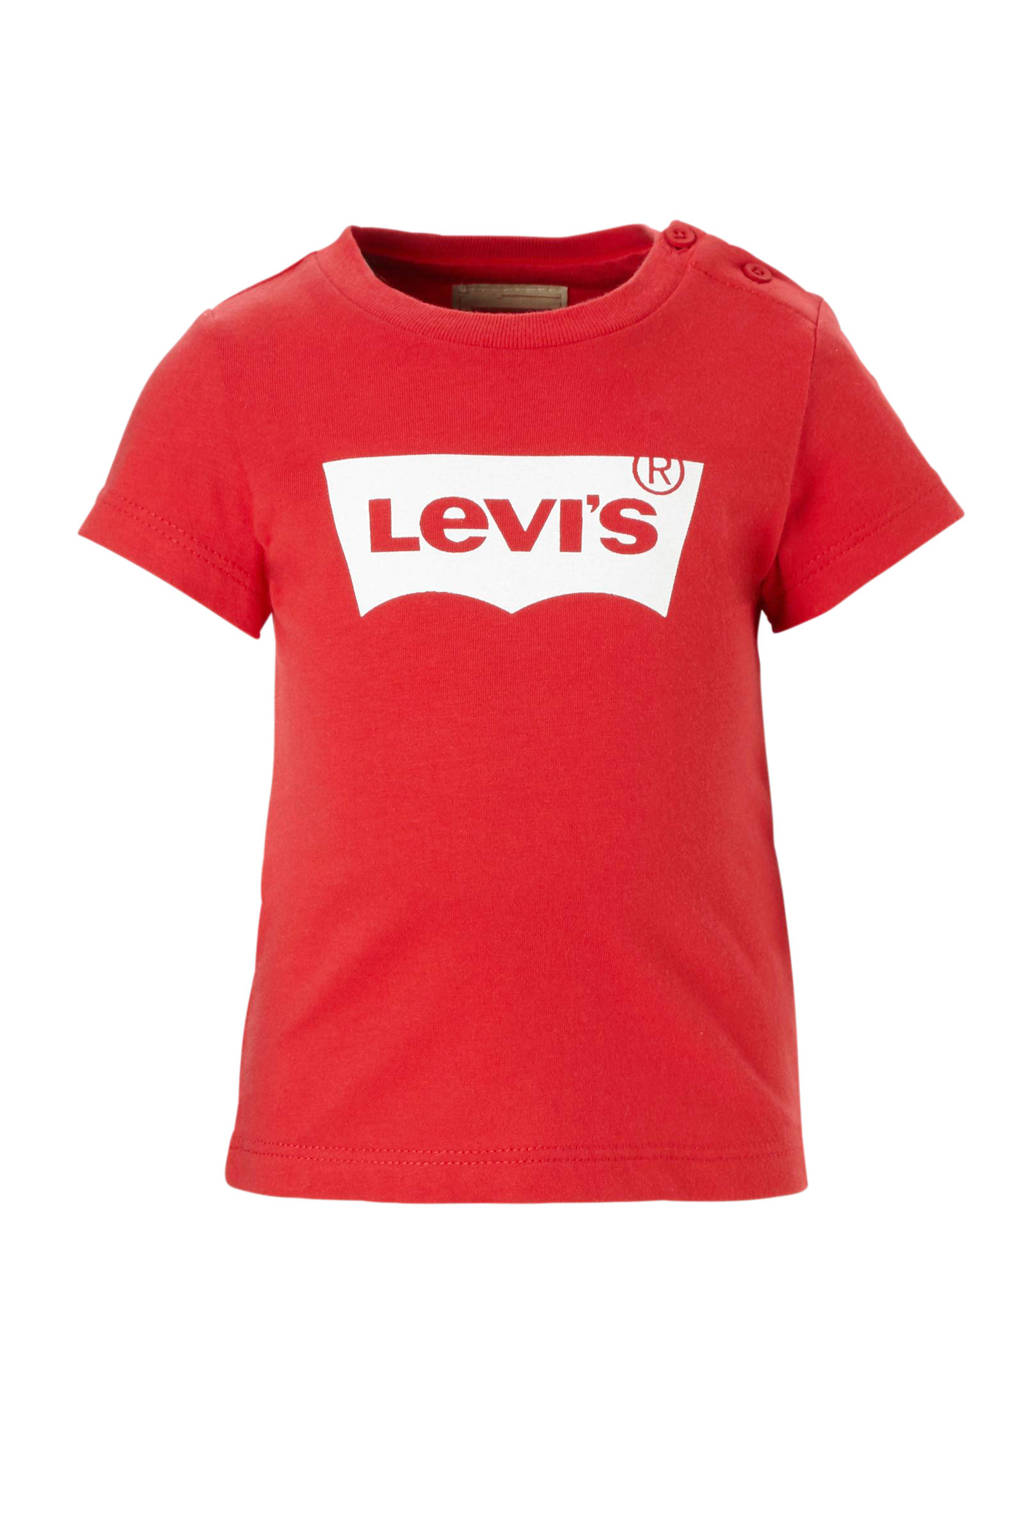 Levi's Kids baby T-shirt met logo rood, Rood